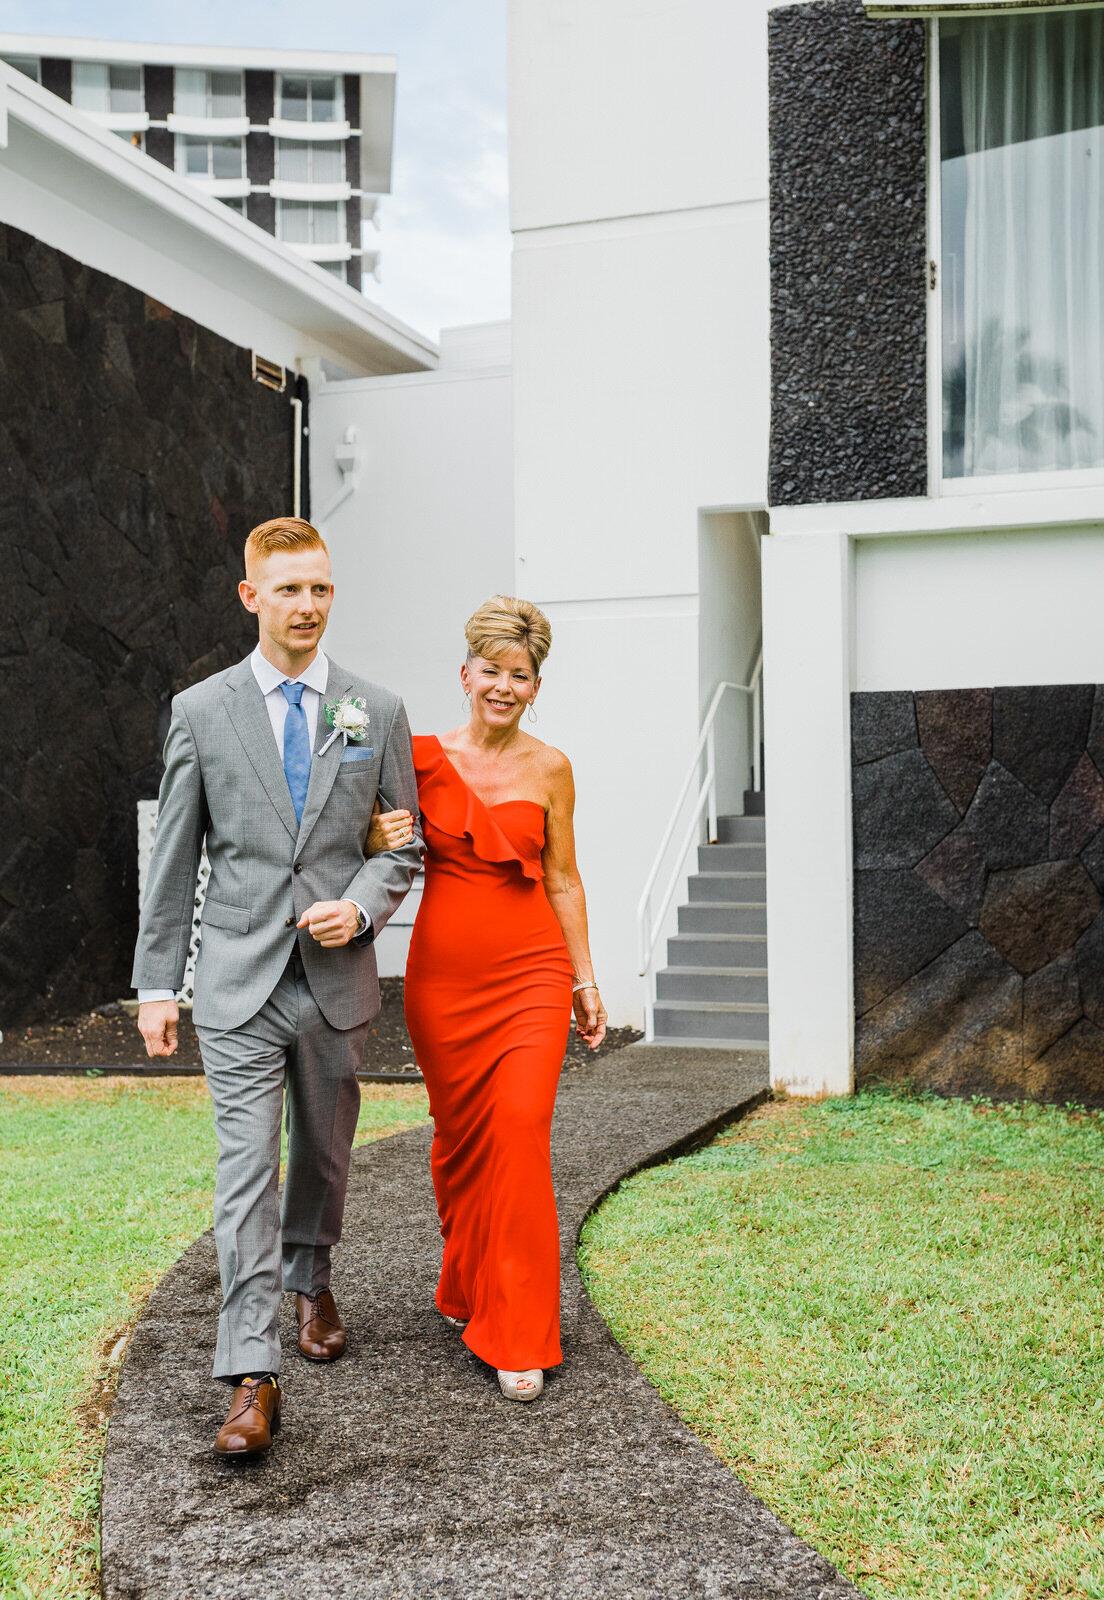 small-wedding-hawaii-destination-hilton-coconut-island-9640.jpg